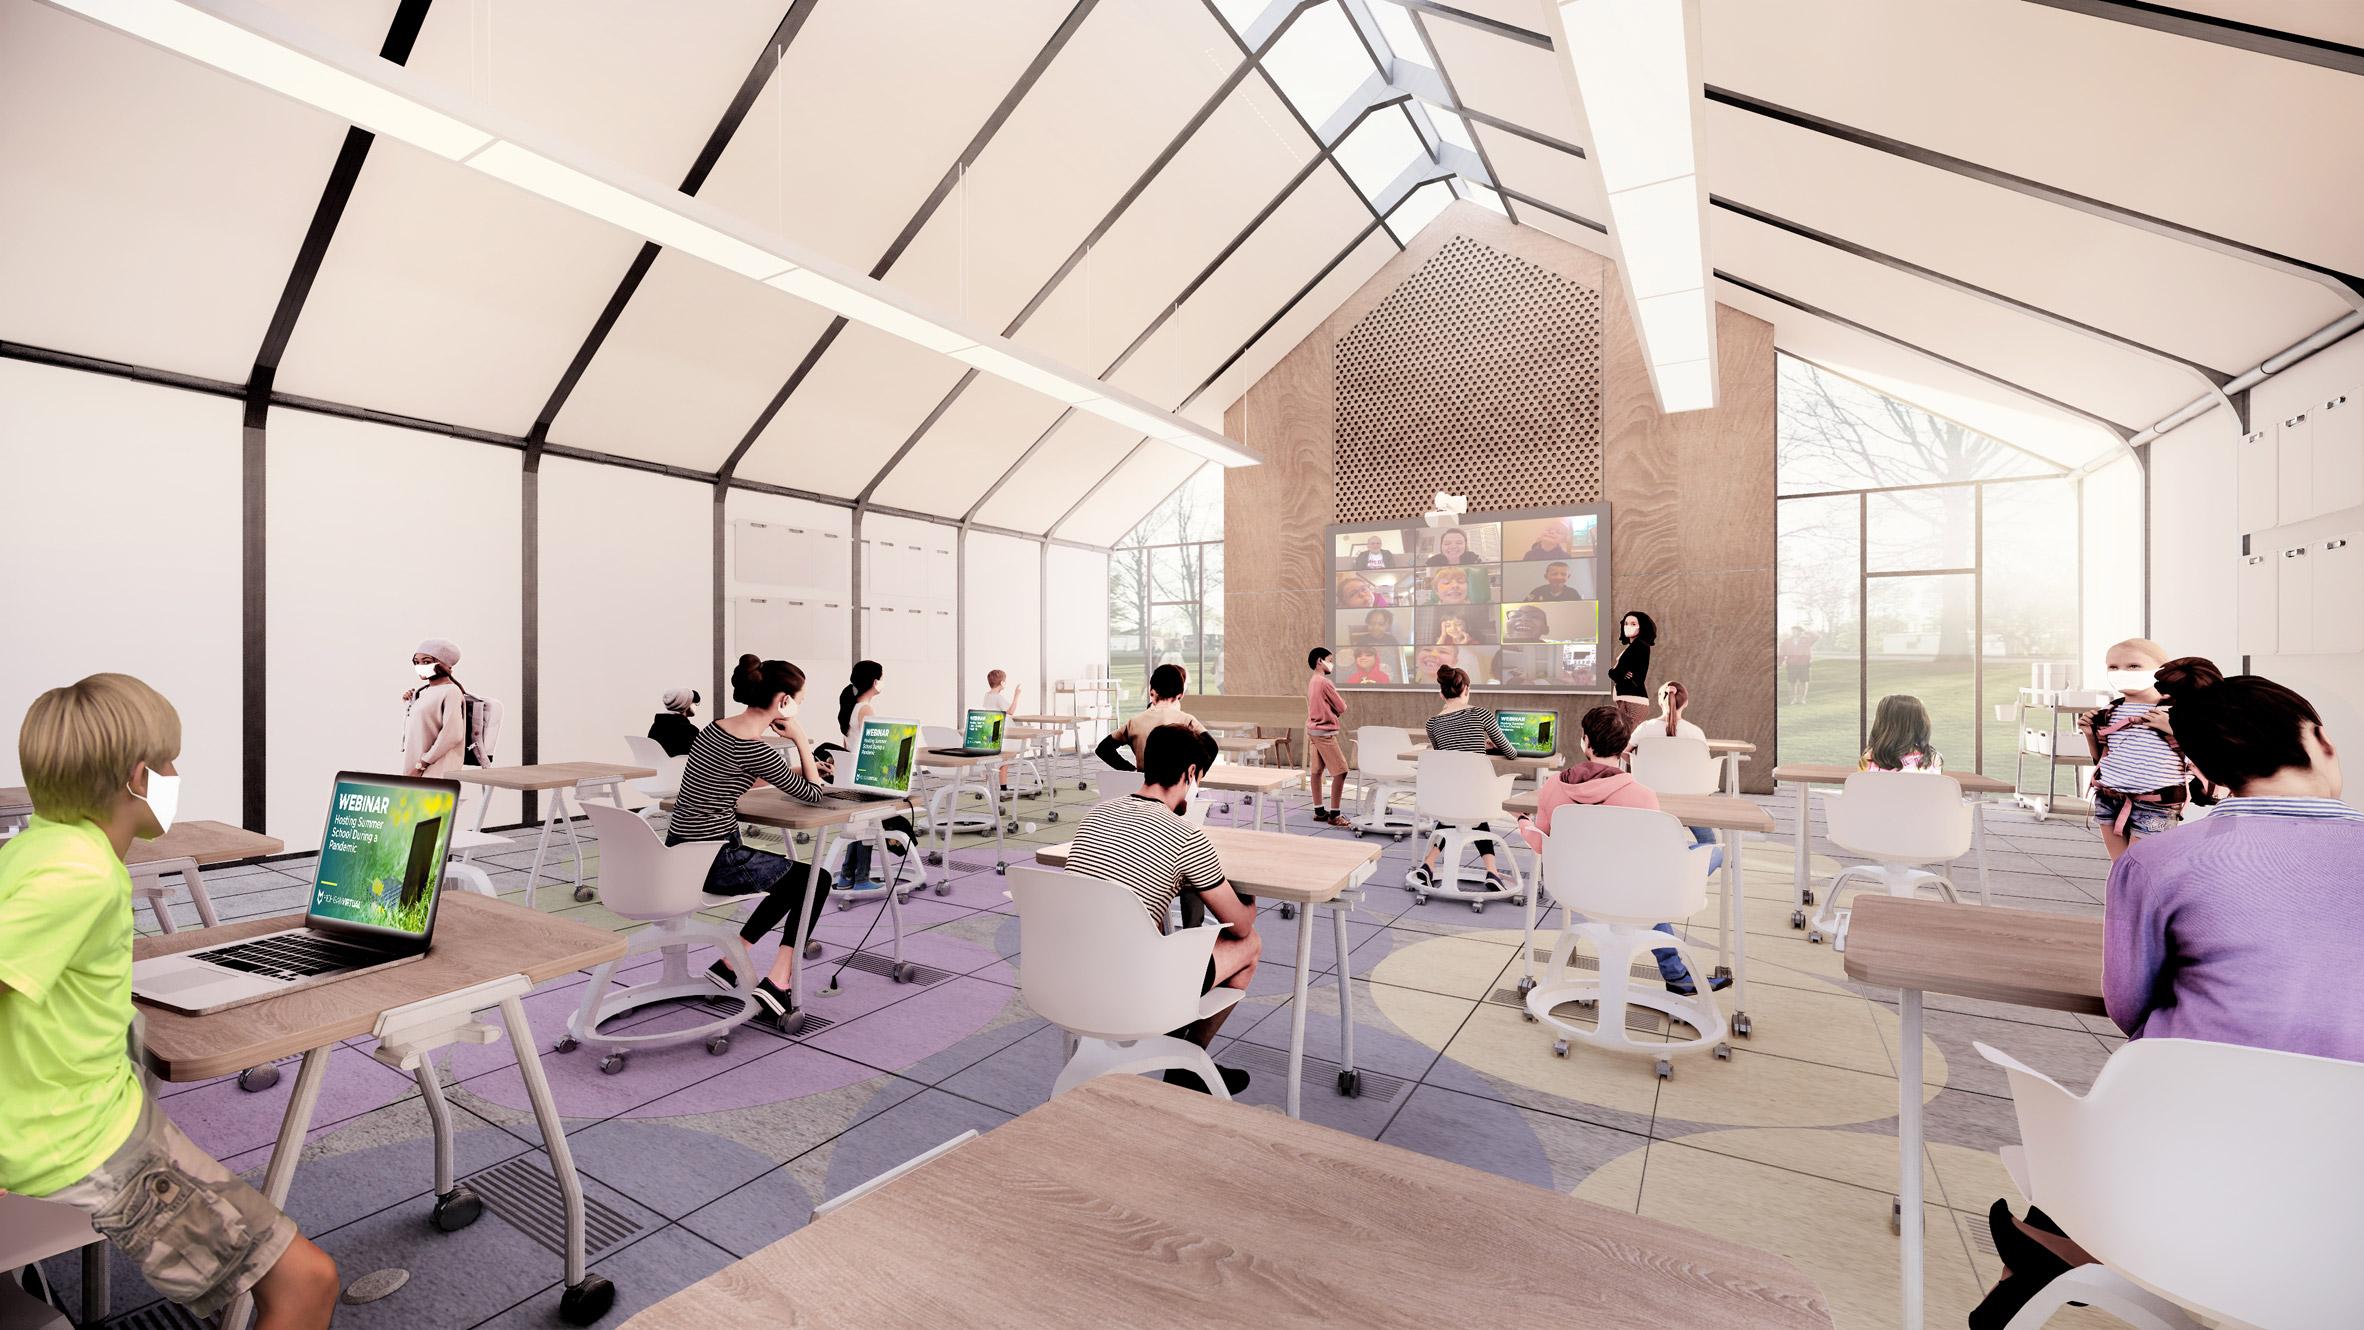 Modular School/House pop-up classrooms for coronavirus by SOM